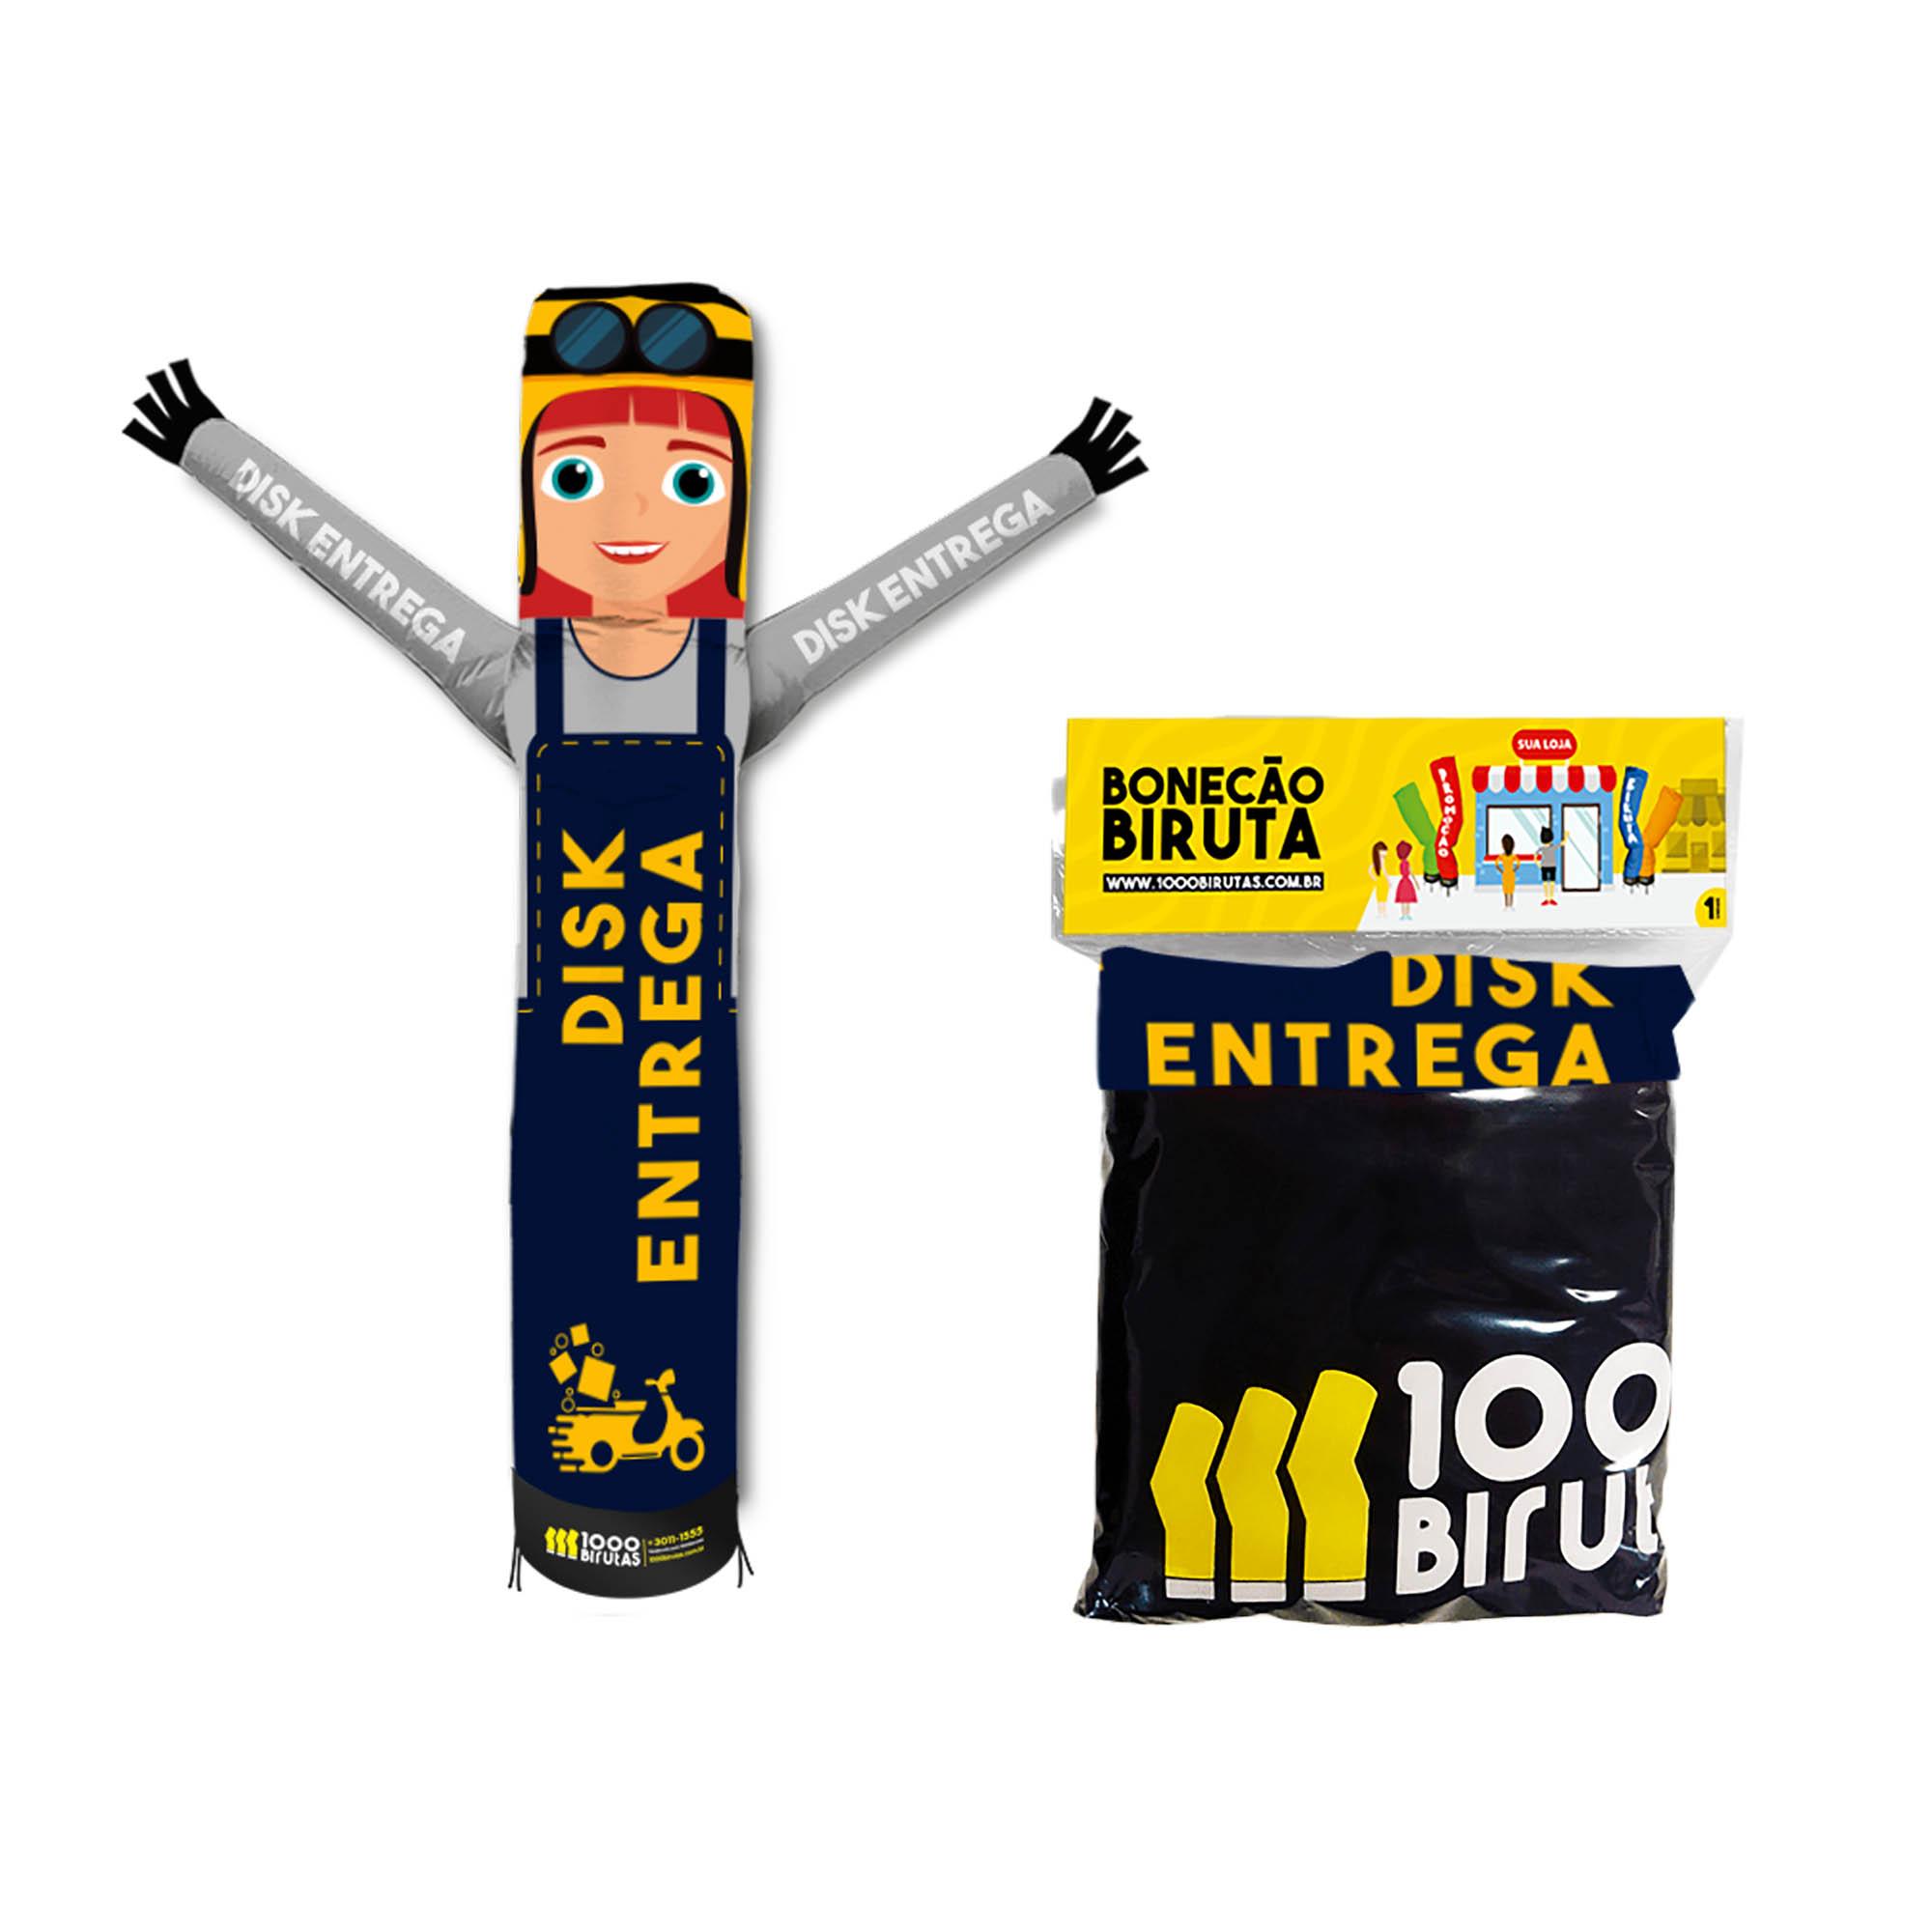 Boneco Bonekito Pano 2M Disk Entregas  - 1000 Birutas